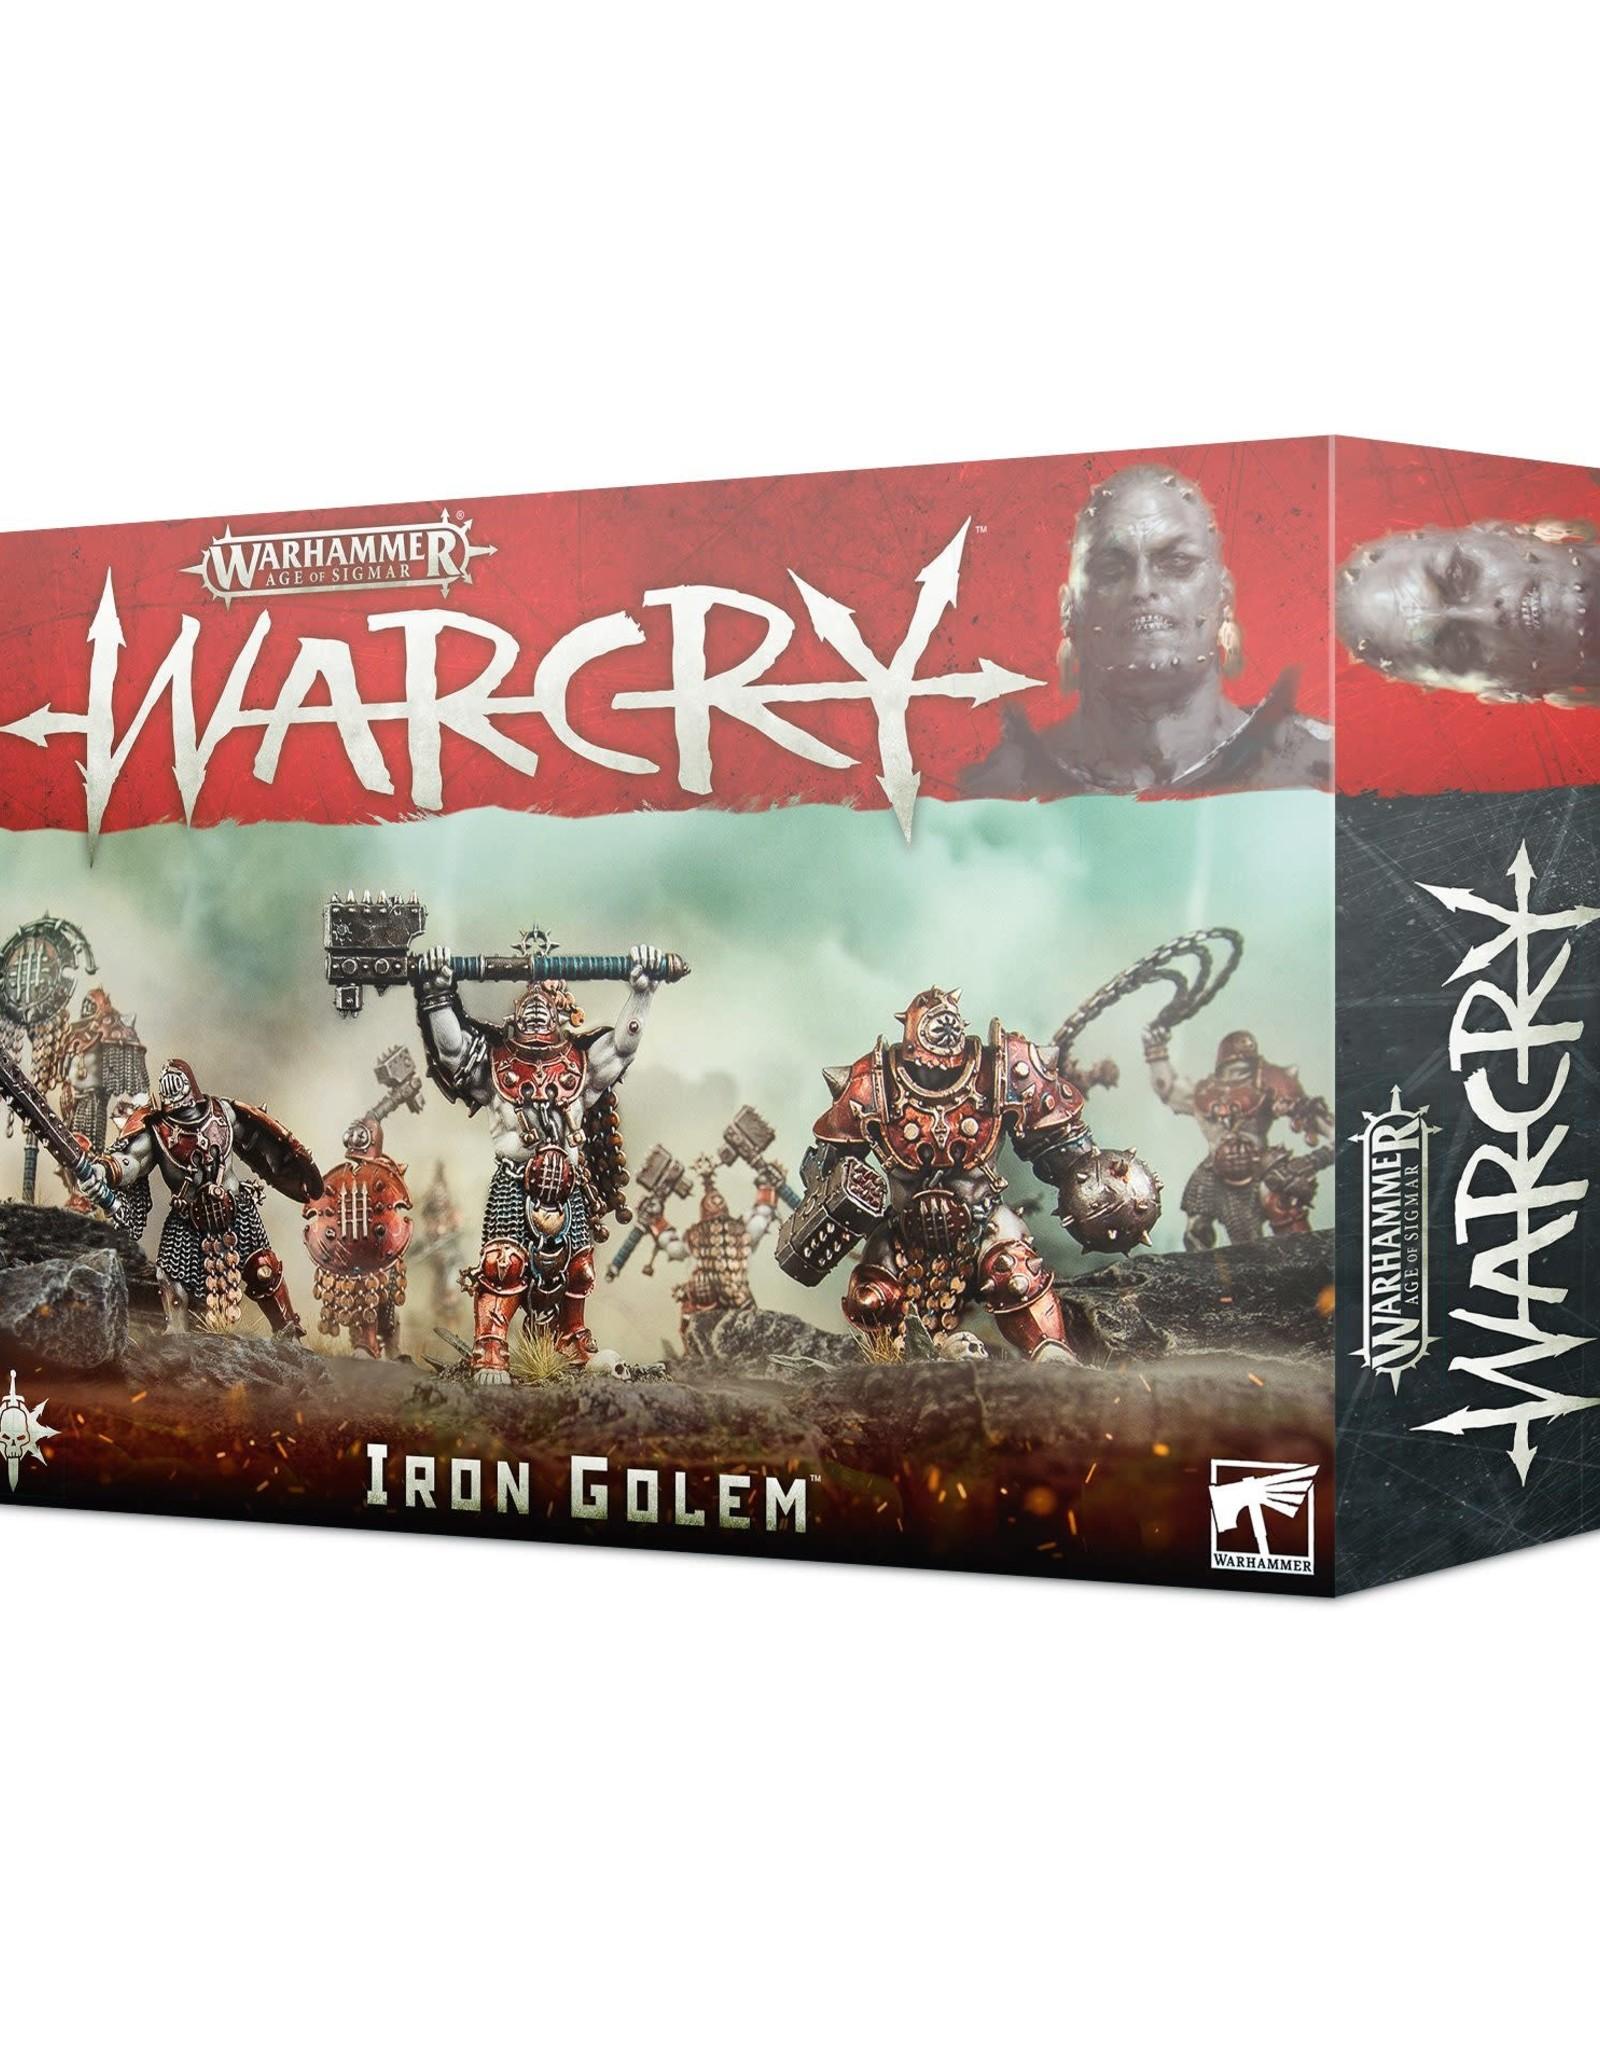 WarCry Warcry: Iron Golem